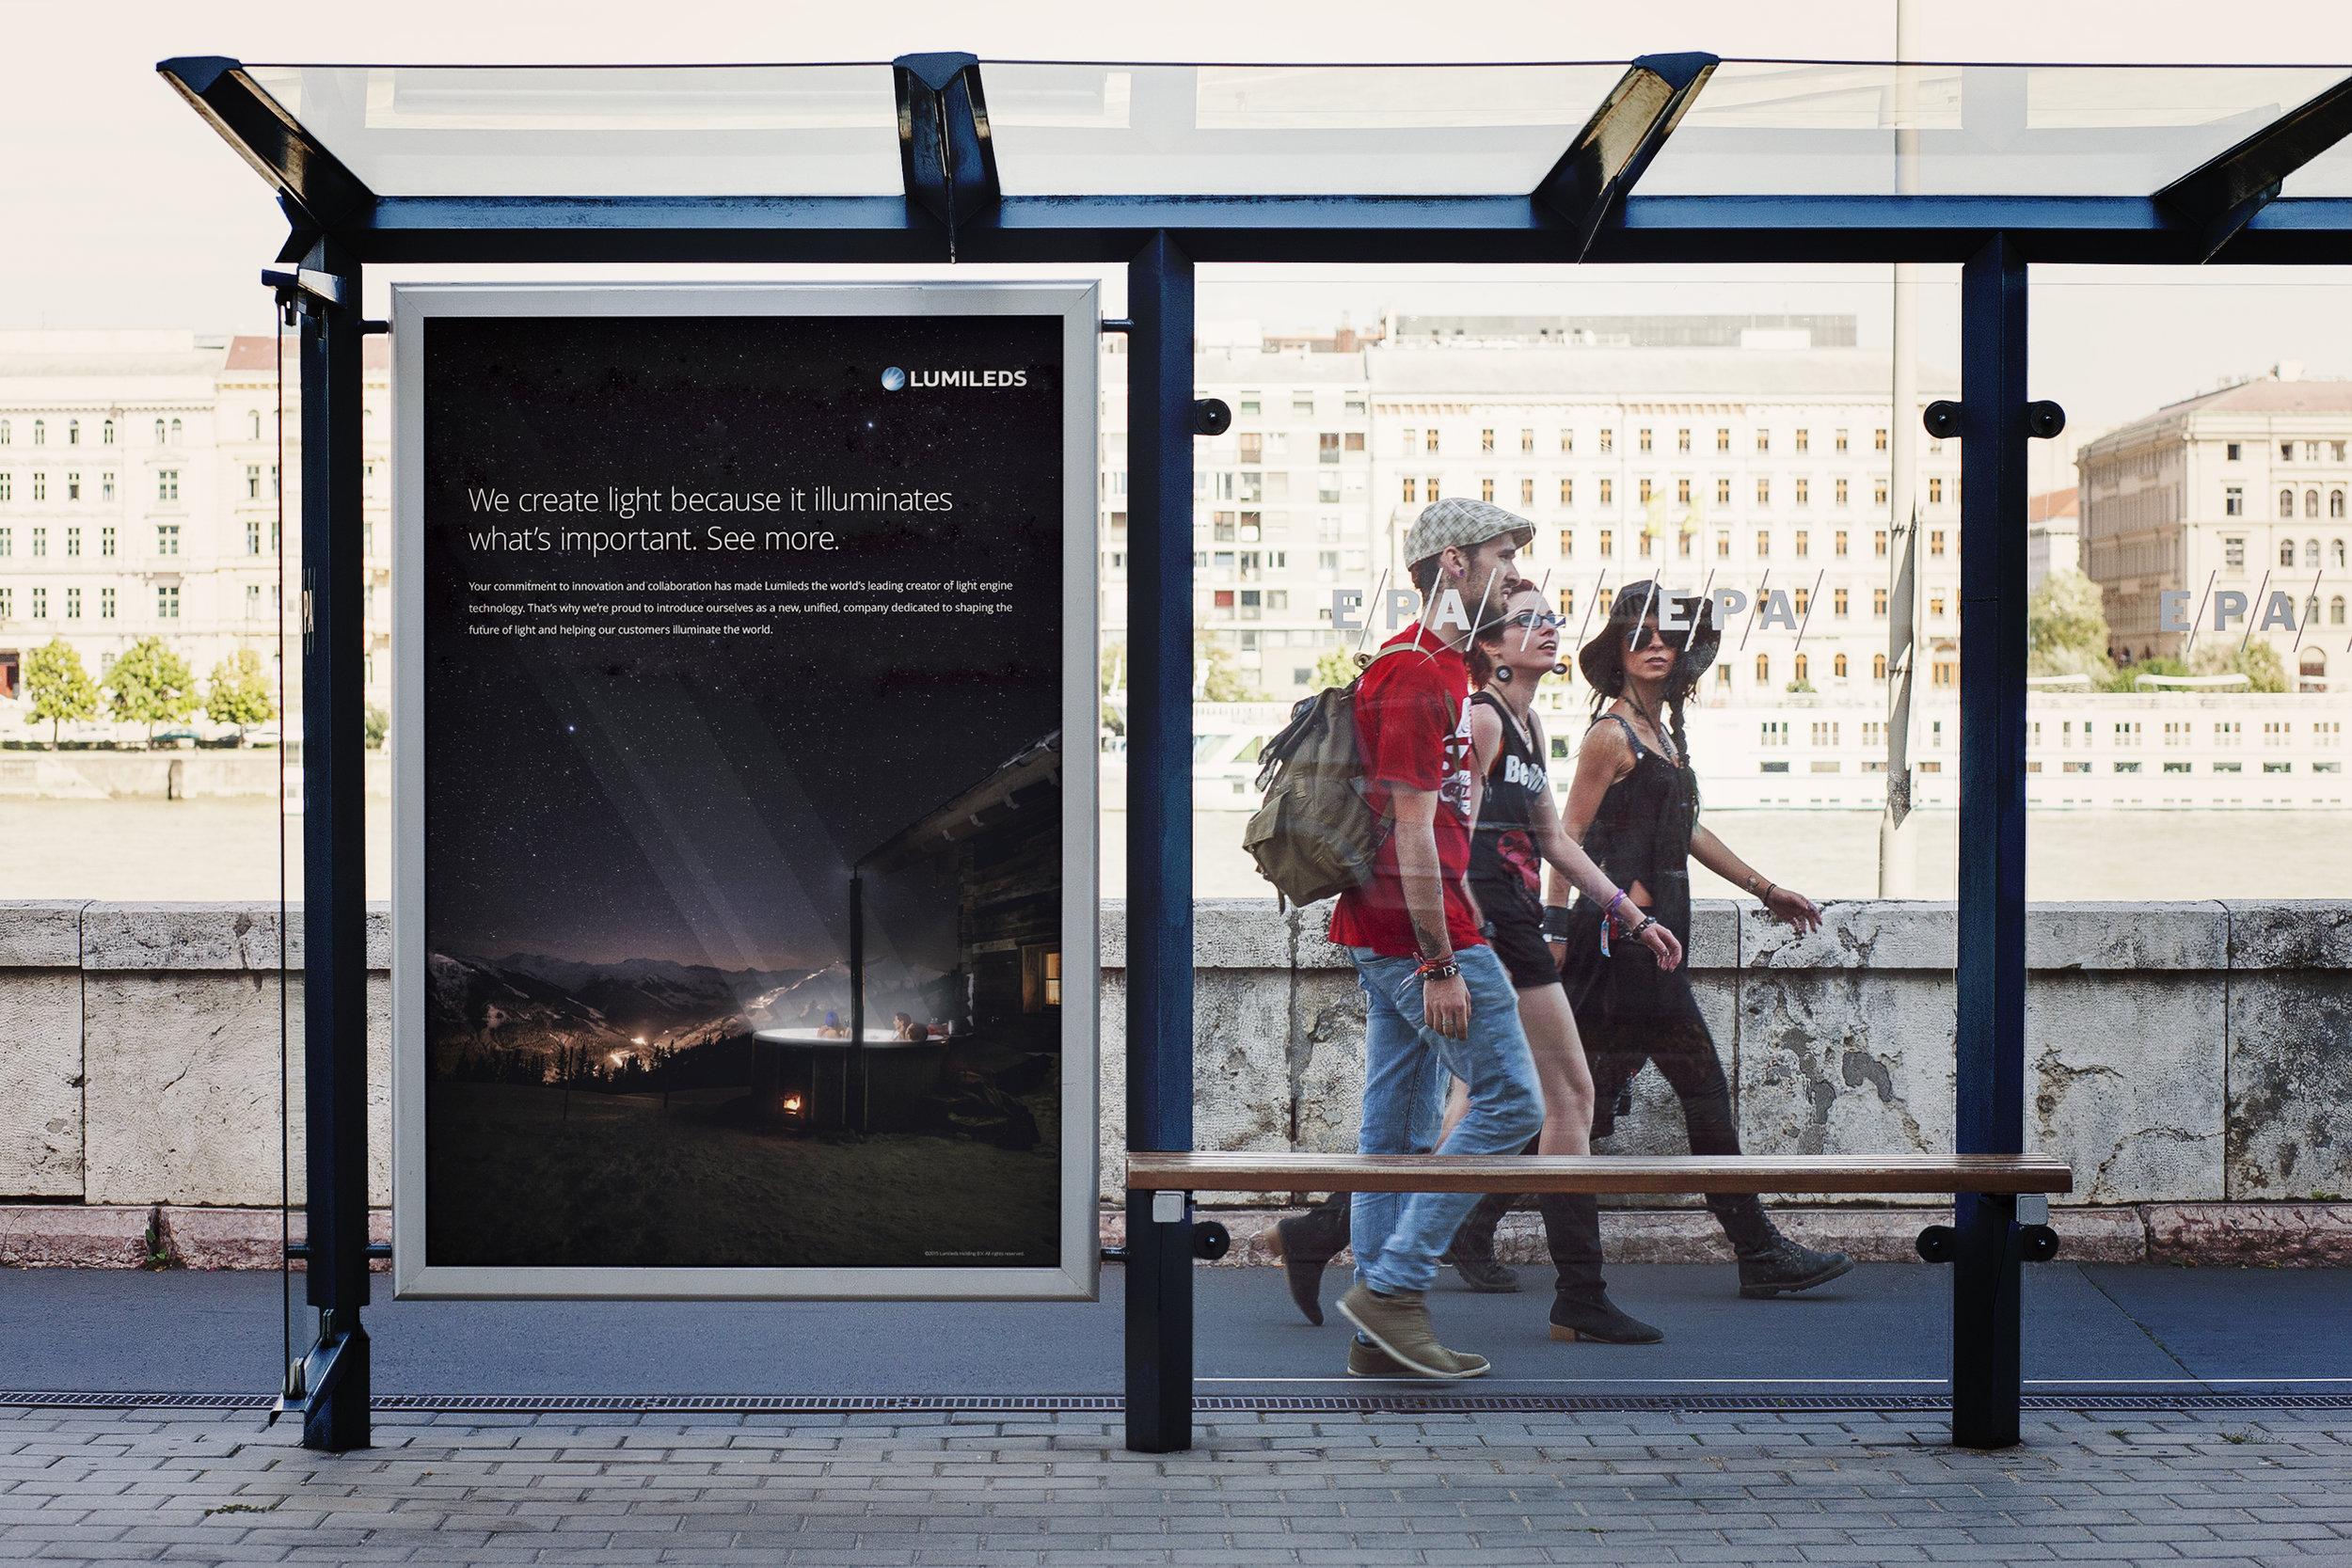 LUM_Launch_Poster_Hottub_Citylight_mockup_vol1.jpg